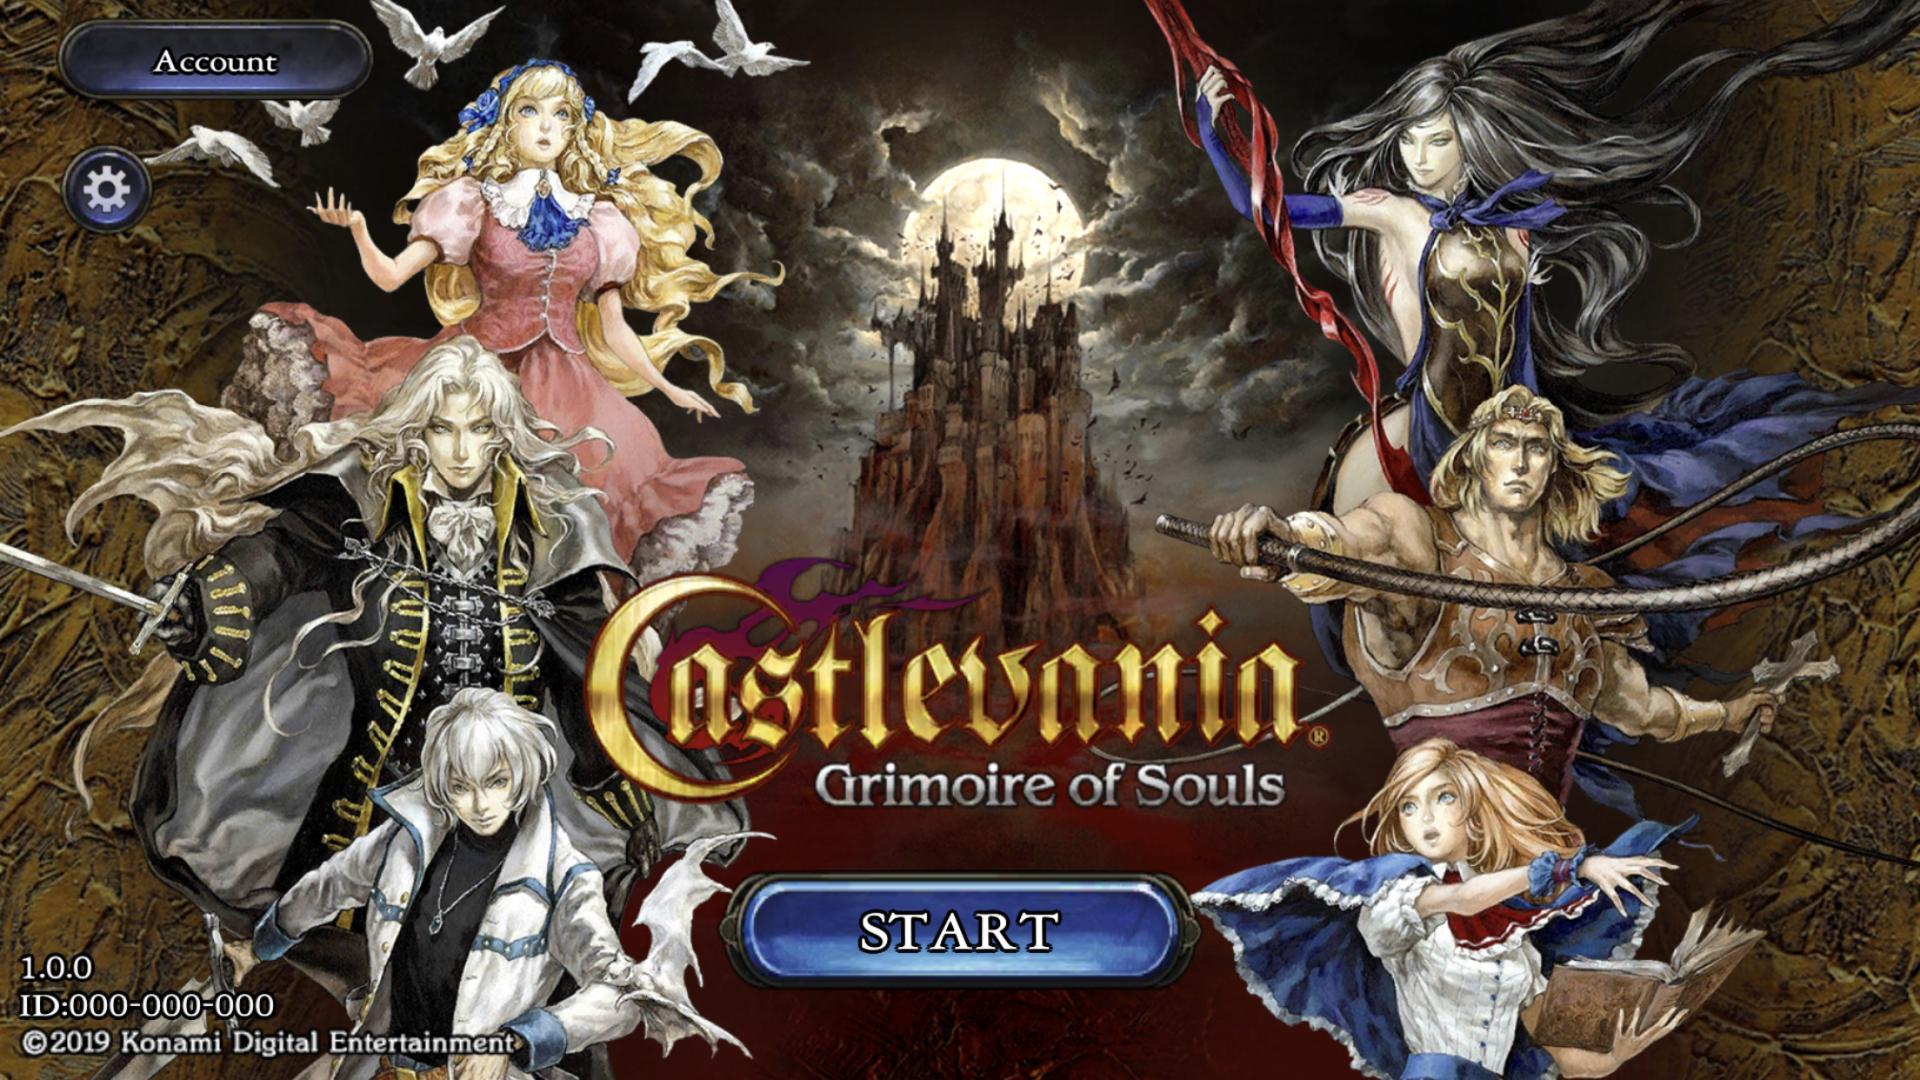 Castlevania Grimoire of Souls 1.1.4 Screenshot 1